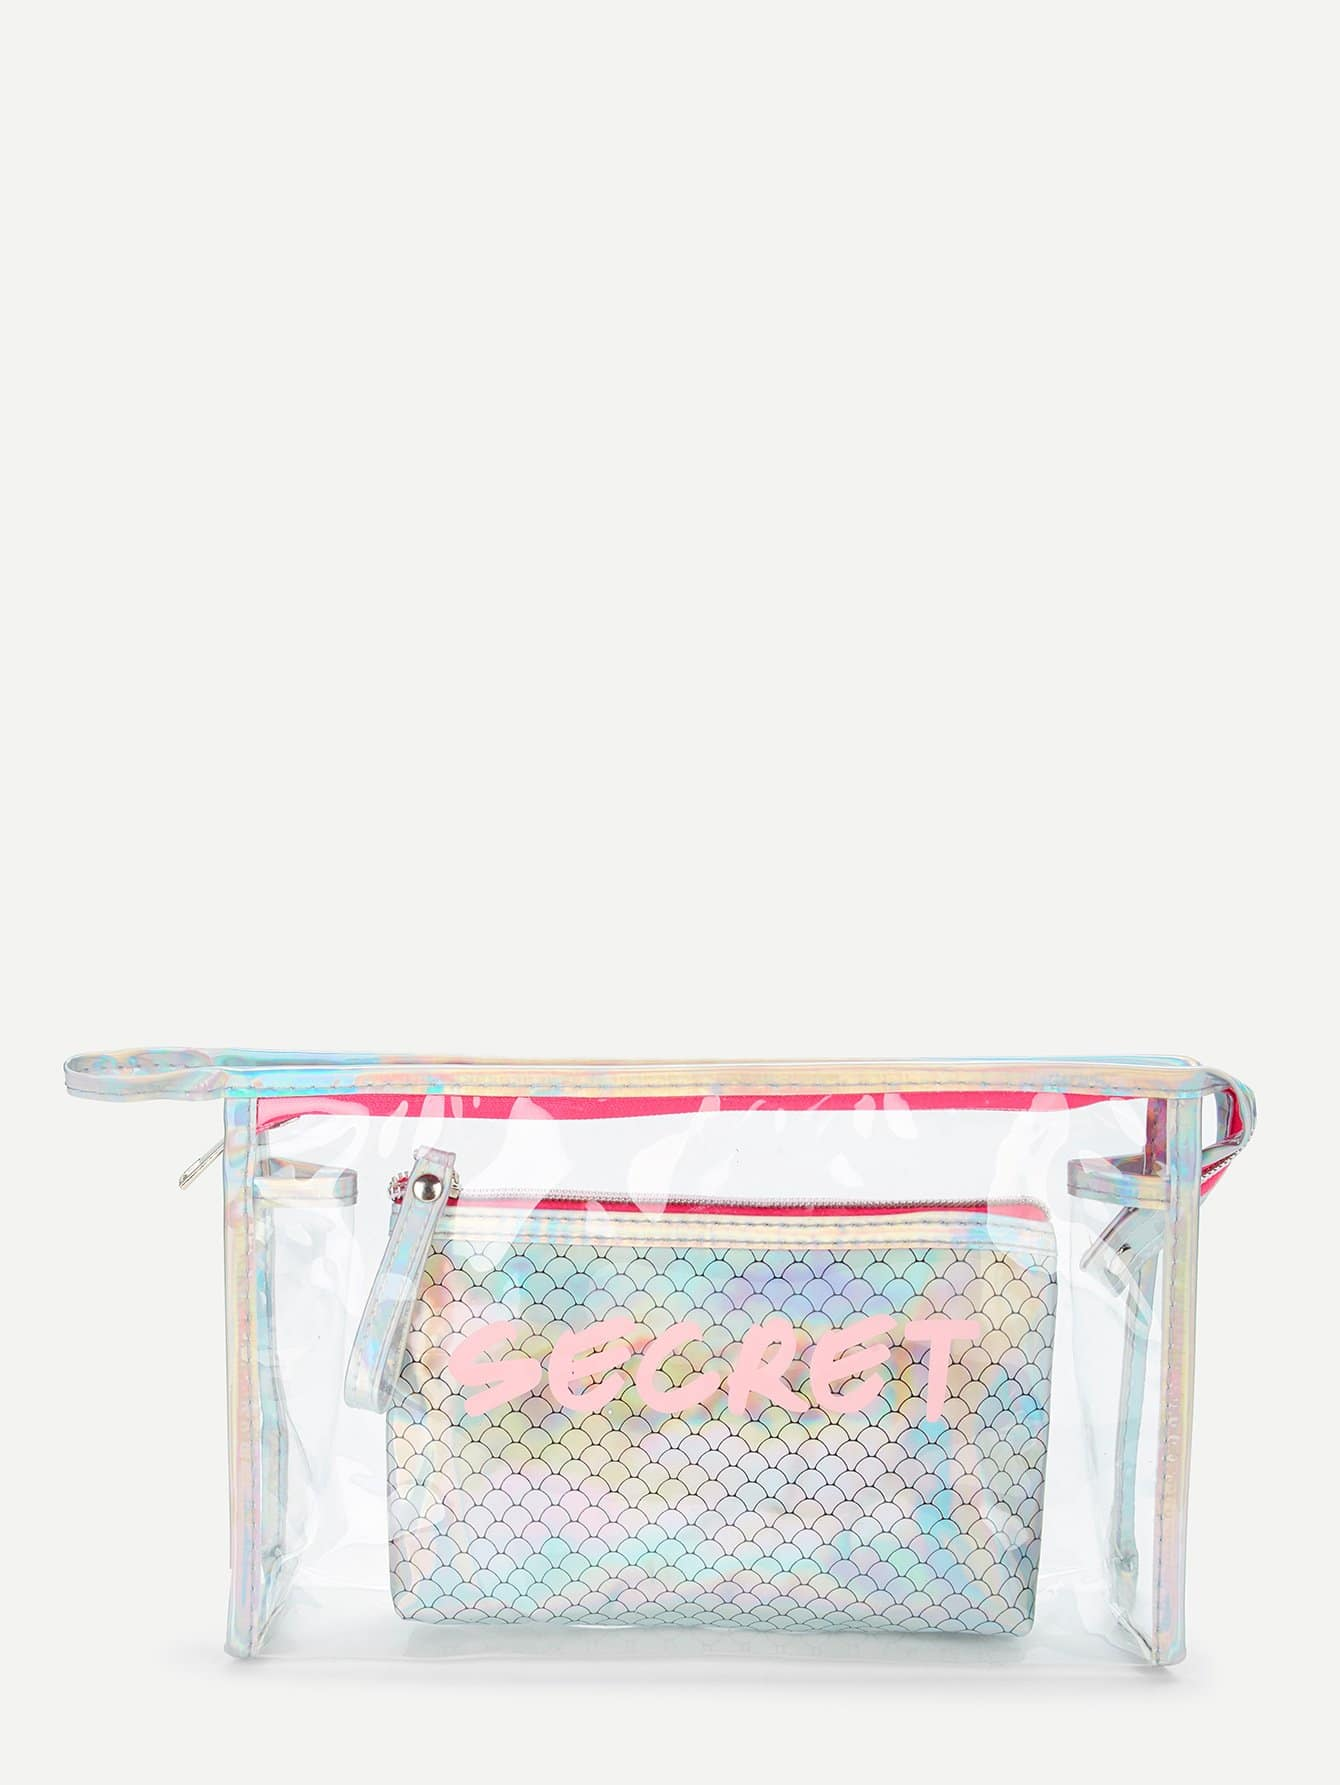 Scale Print Makeup Bag 2pcs fashion women travel kit jewelry organizer makeup cosmetic bag